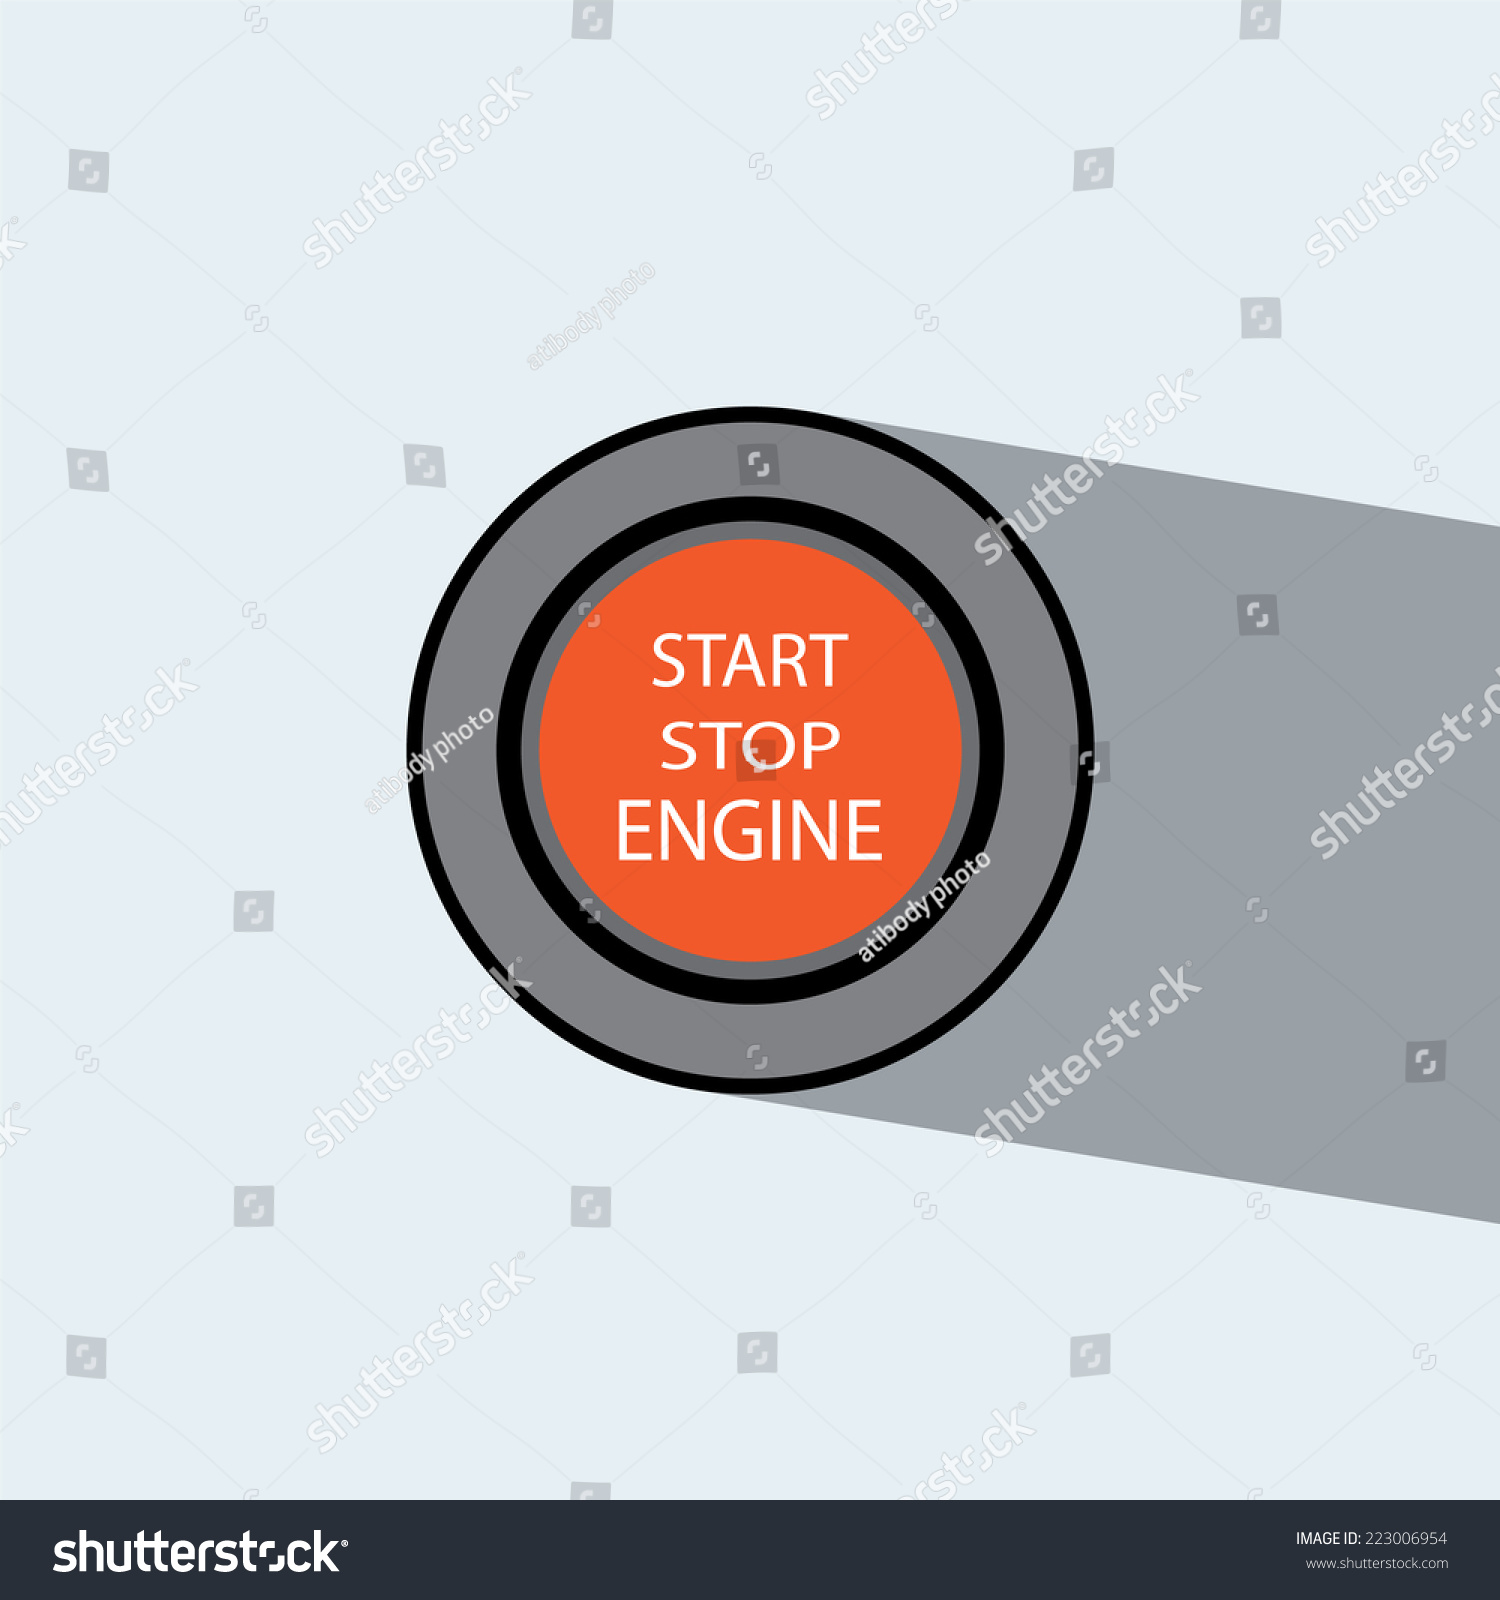 tf34 engine diagram volvo 240 radio wiring diagram